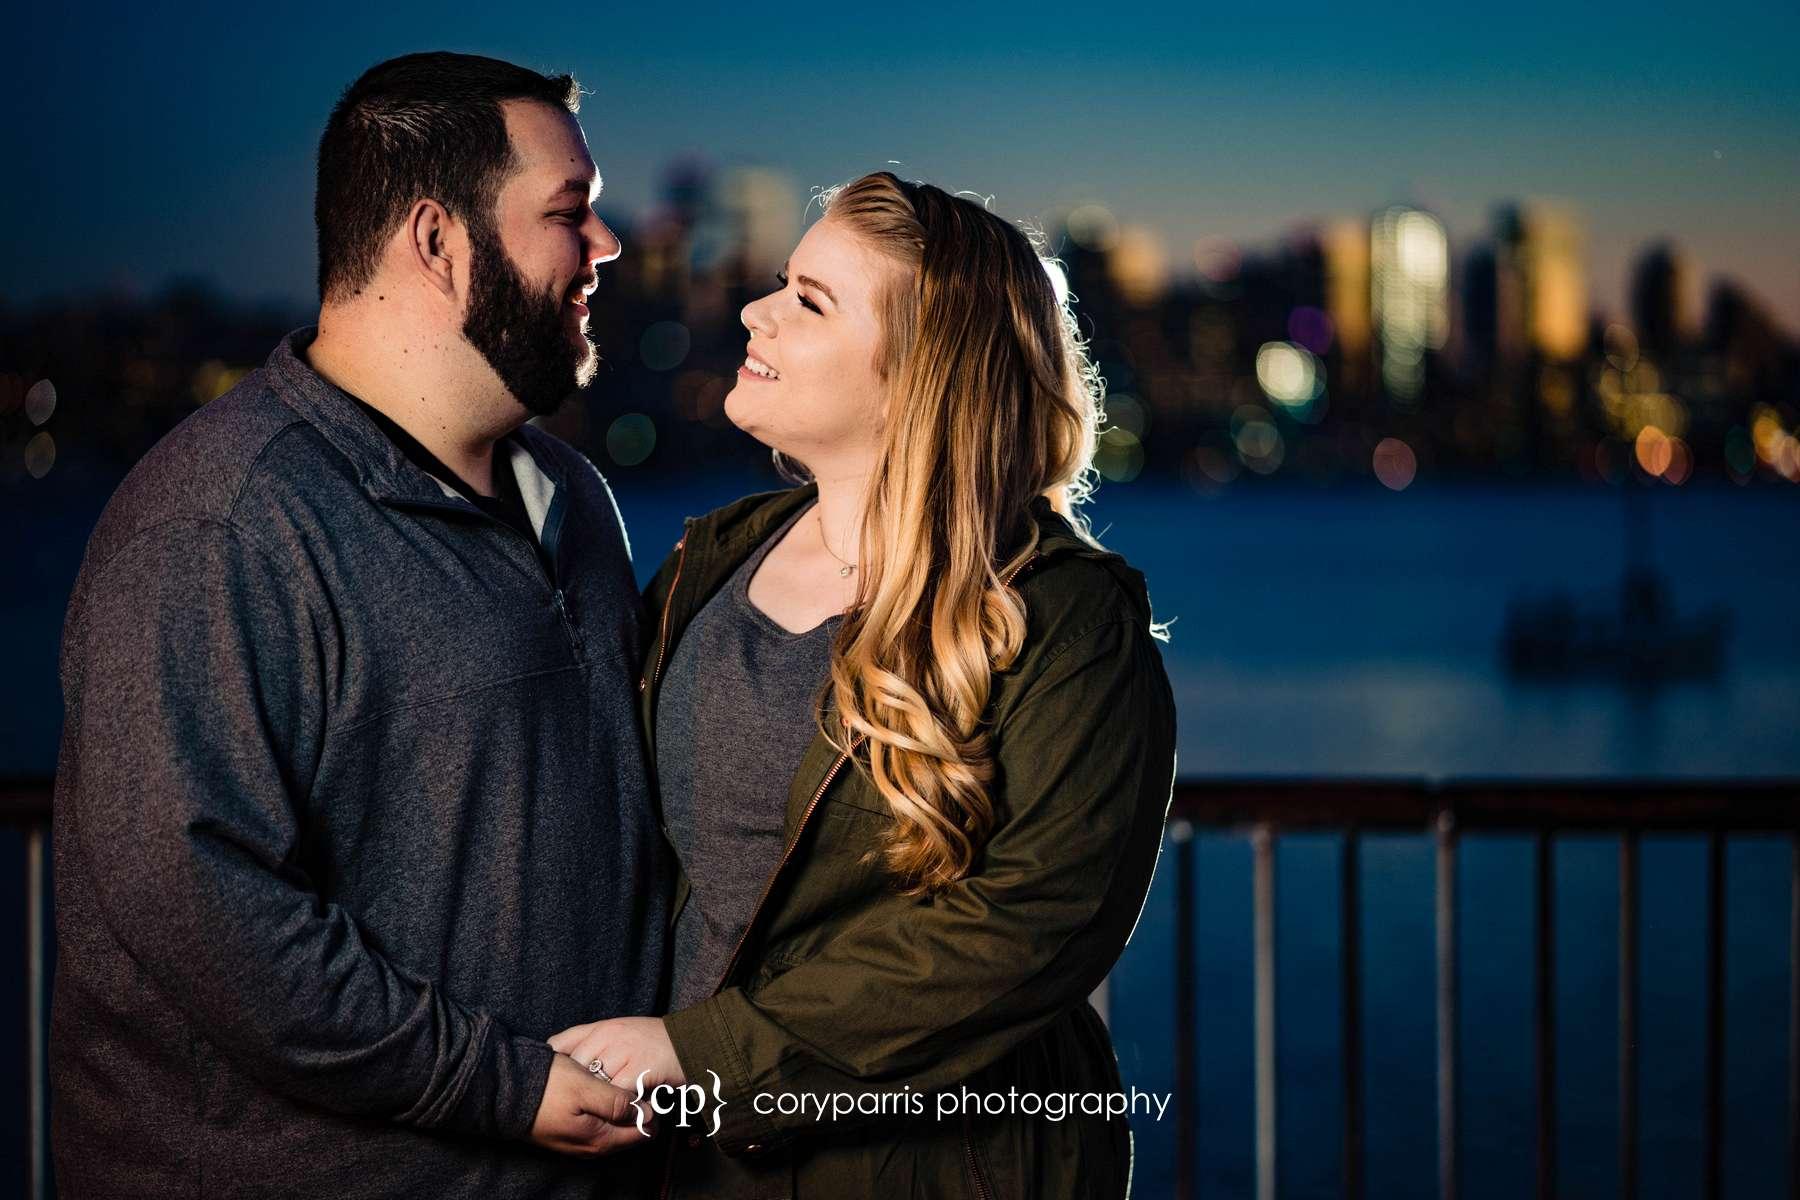 192-Gas-Works-Park-Engagement-Portraits-Seattle.jpg